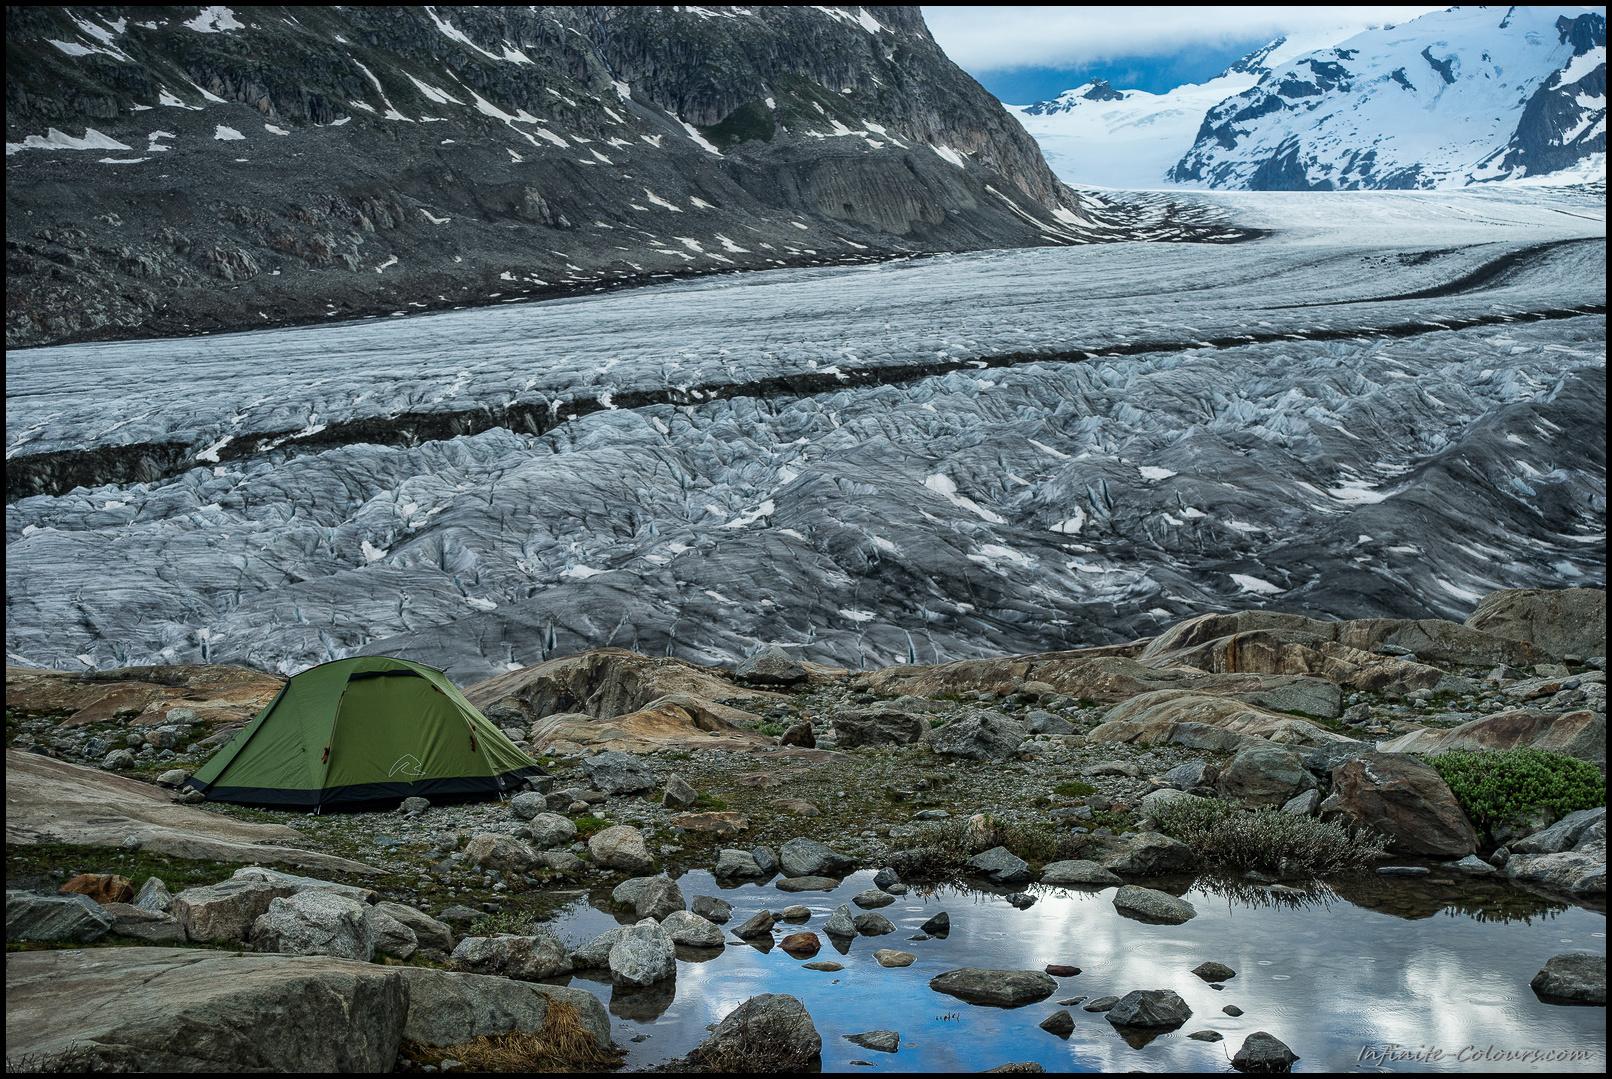 Jungfrau Aletsch glacier camp I